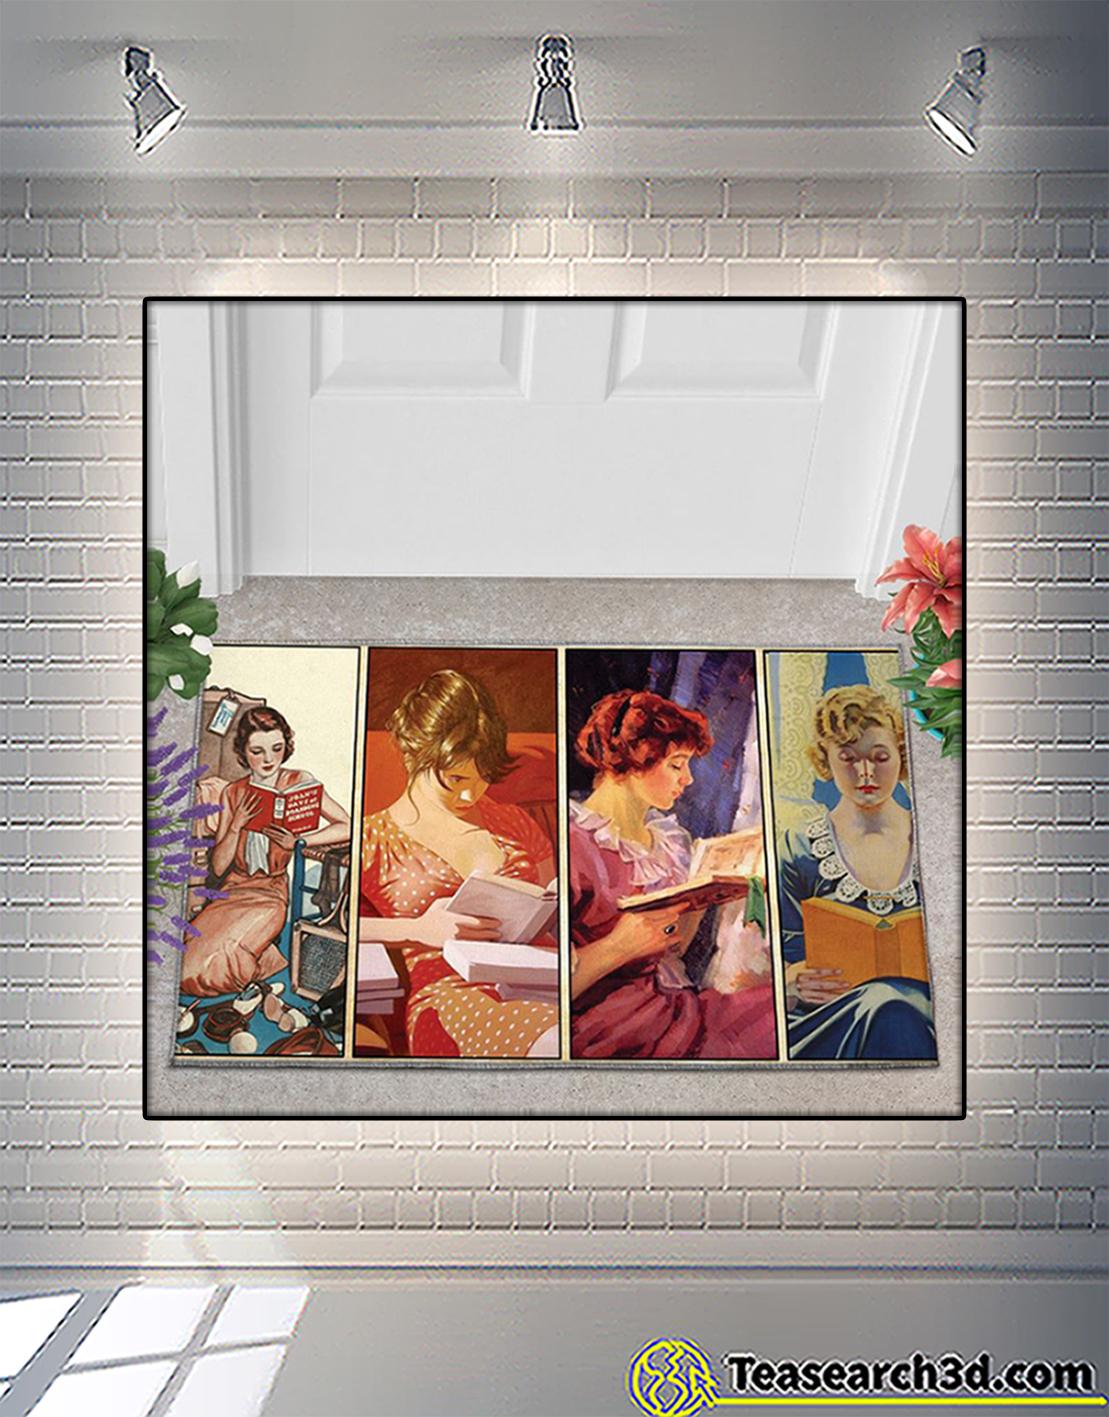 Woman loves reading doormat 2